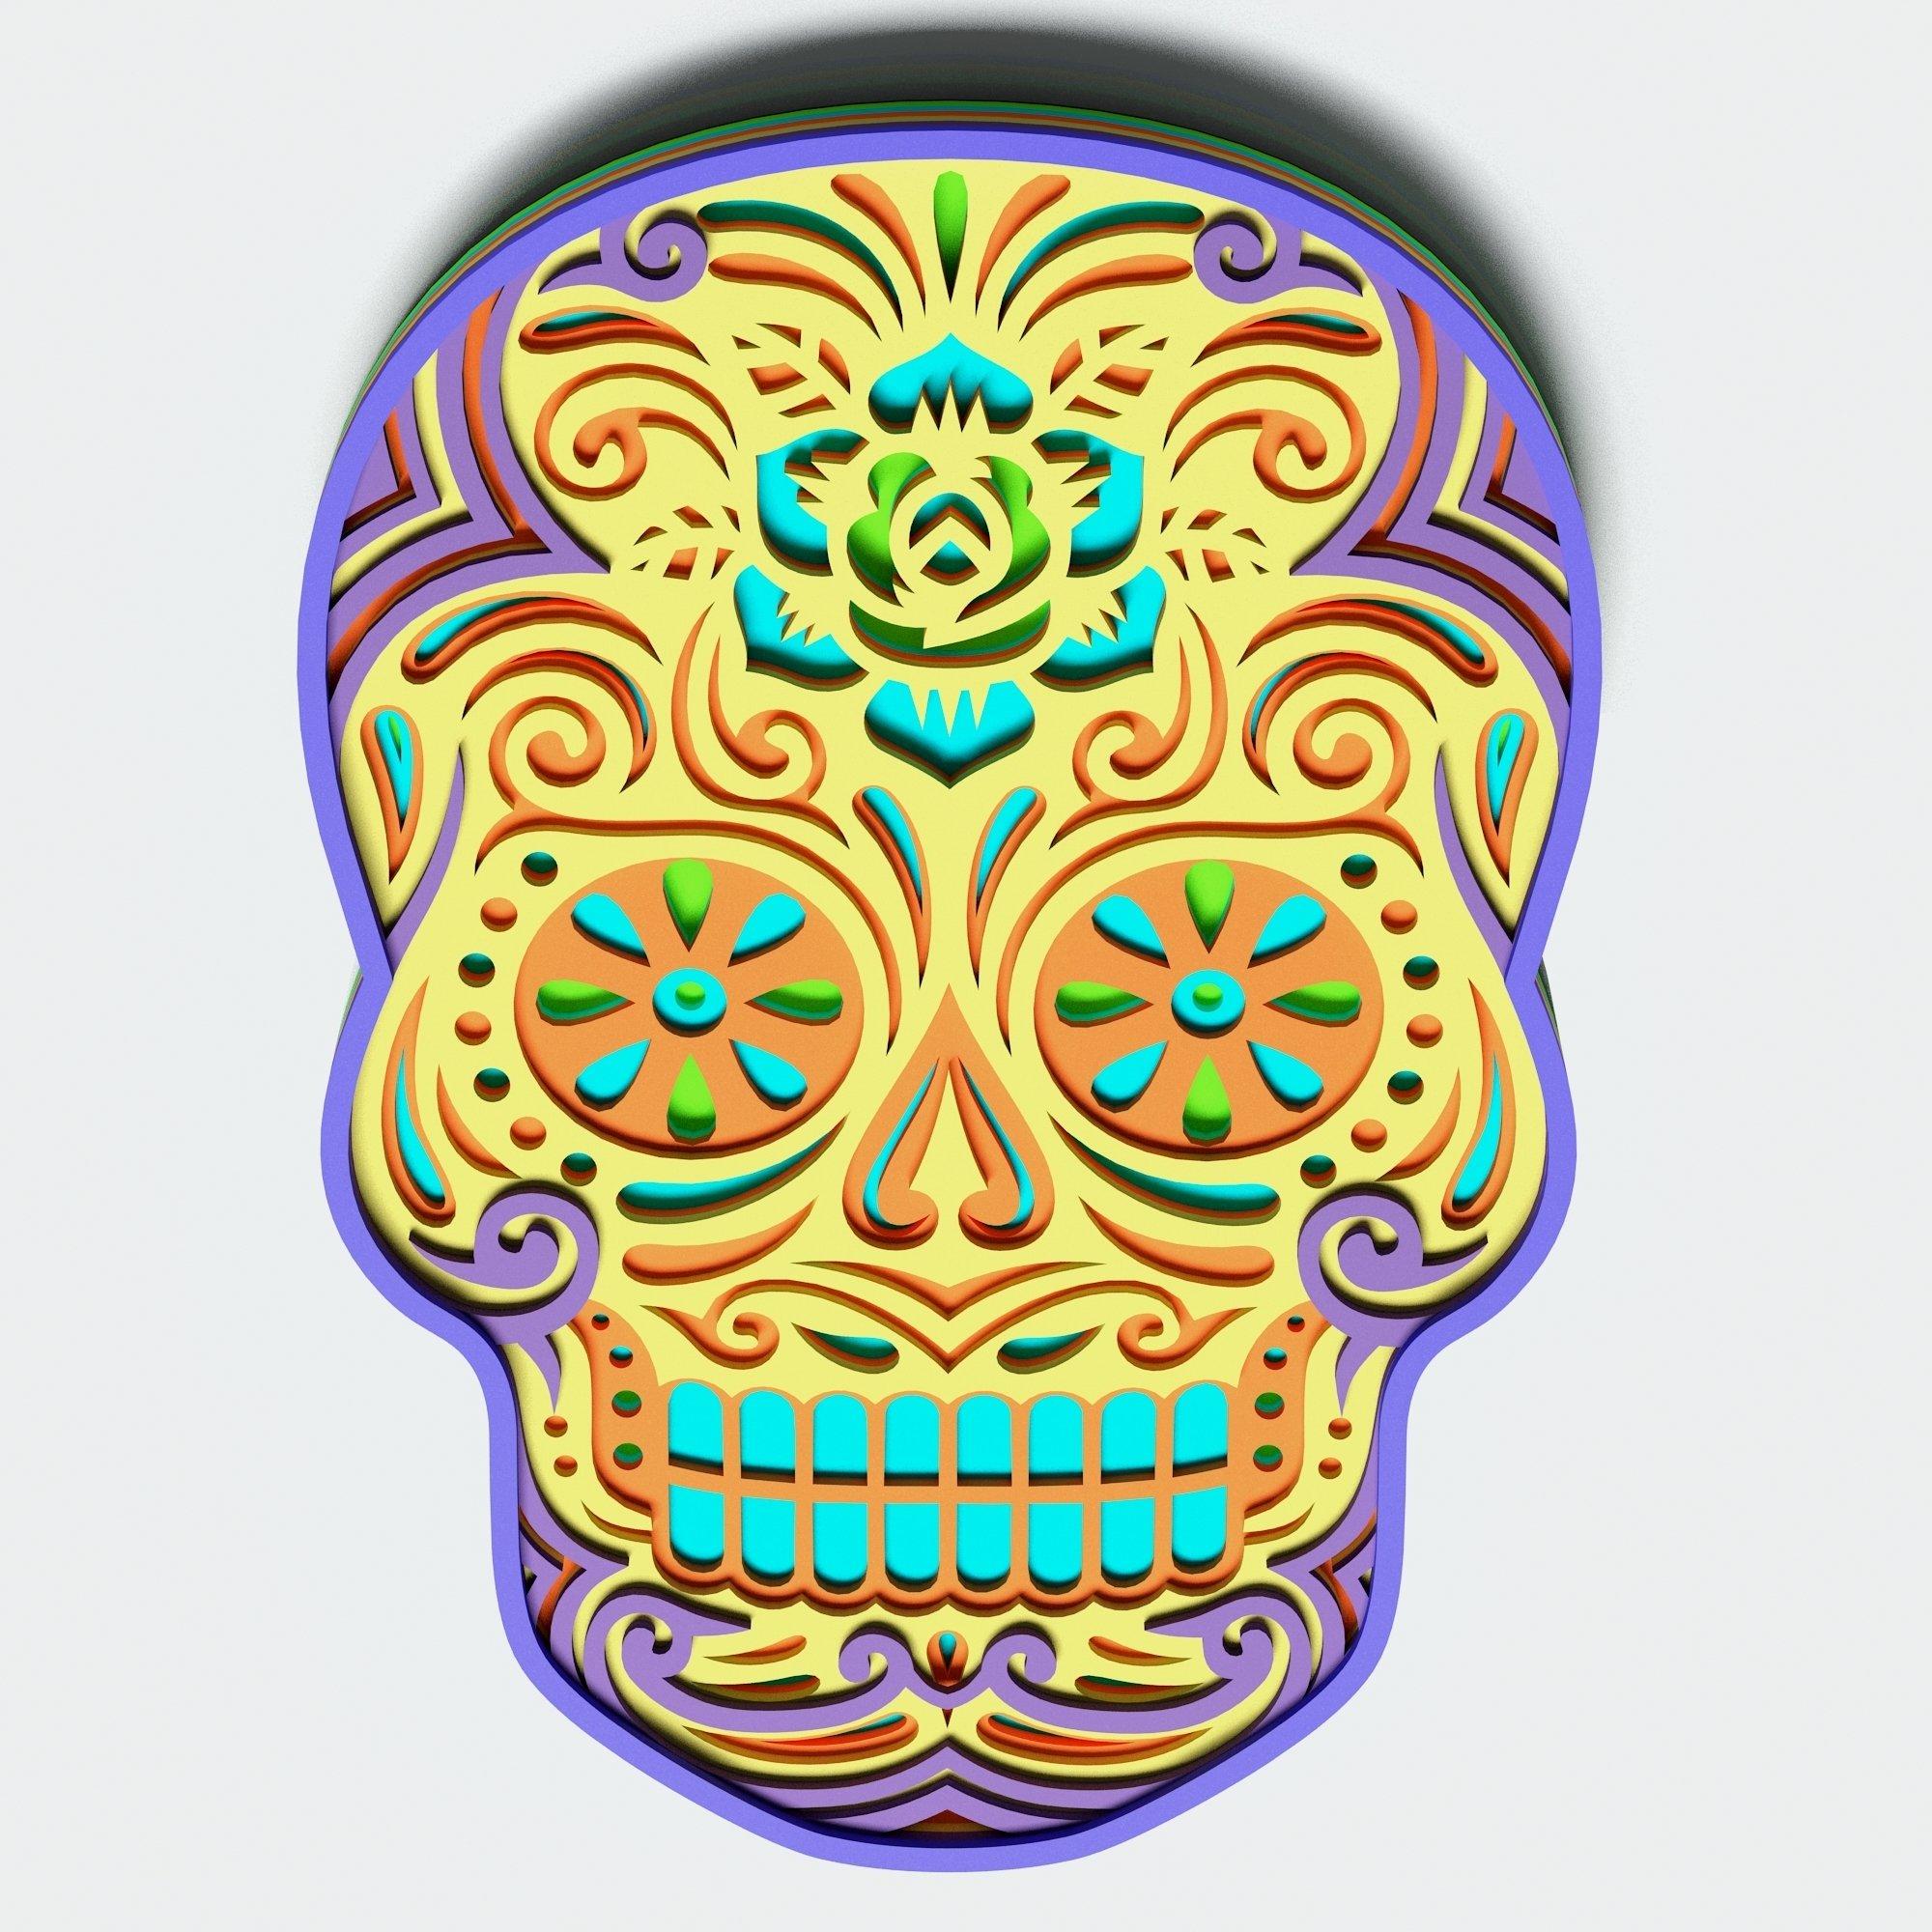 Multilayer Sugar Skull Mandala - S2, for cutting machines example image 6